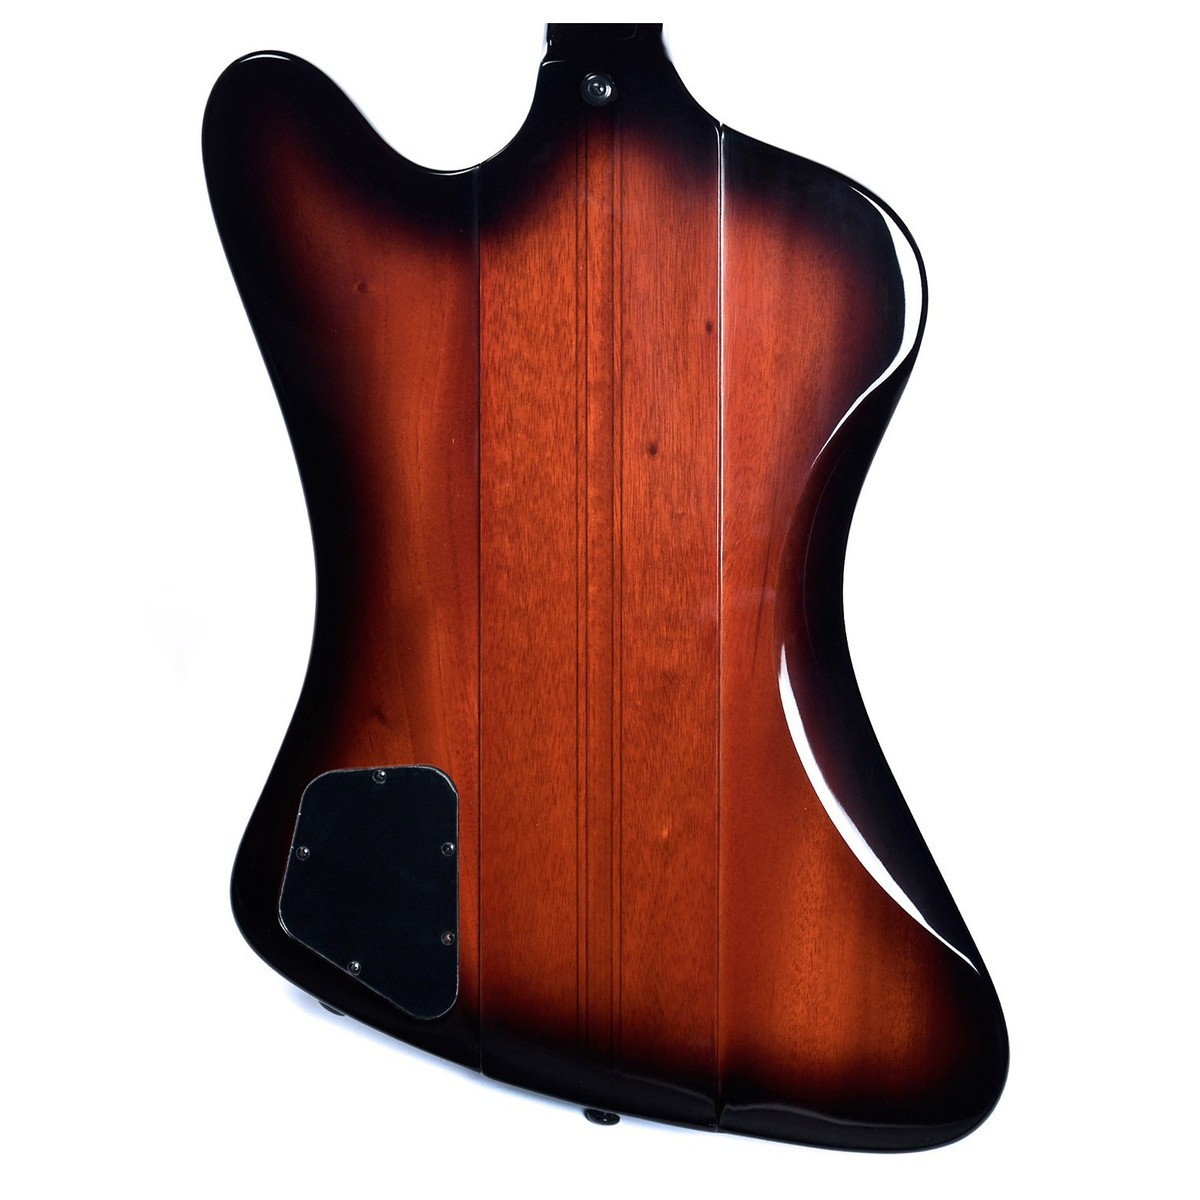 epiphone thunderbird pro iv active bass vintage sunburst at gear4music. Black Bedroom Furniture Sets. Home Design Ideas